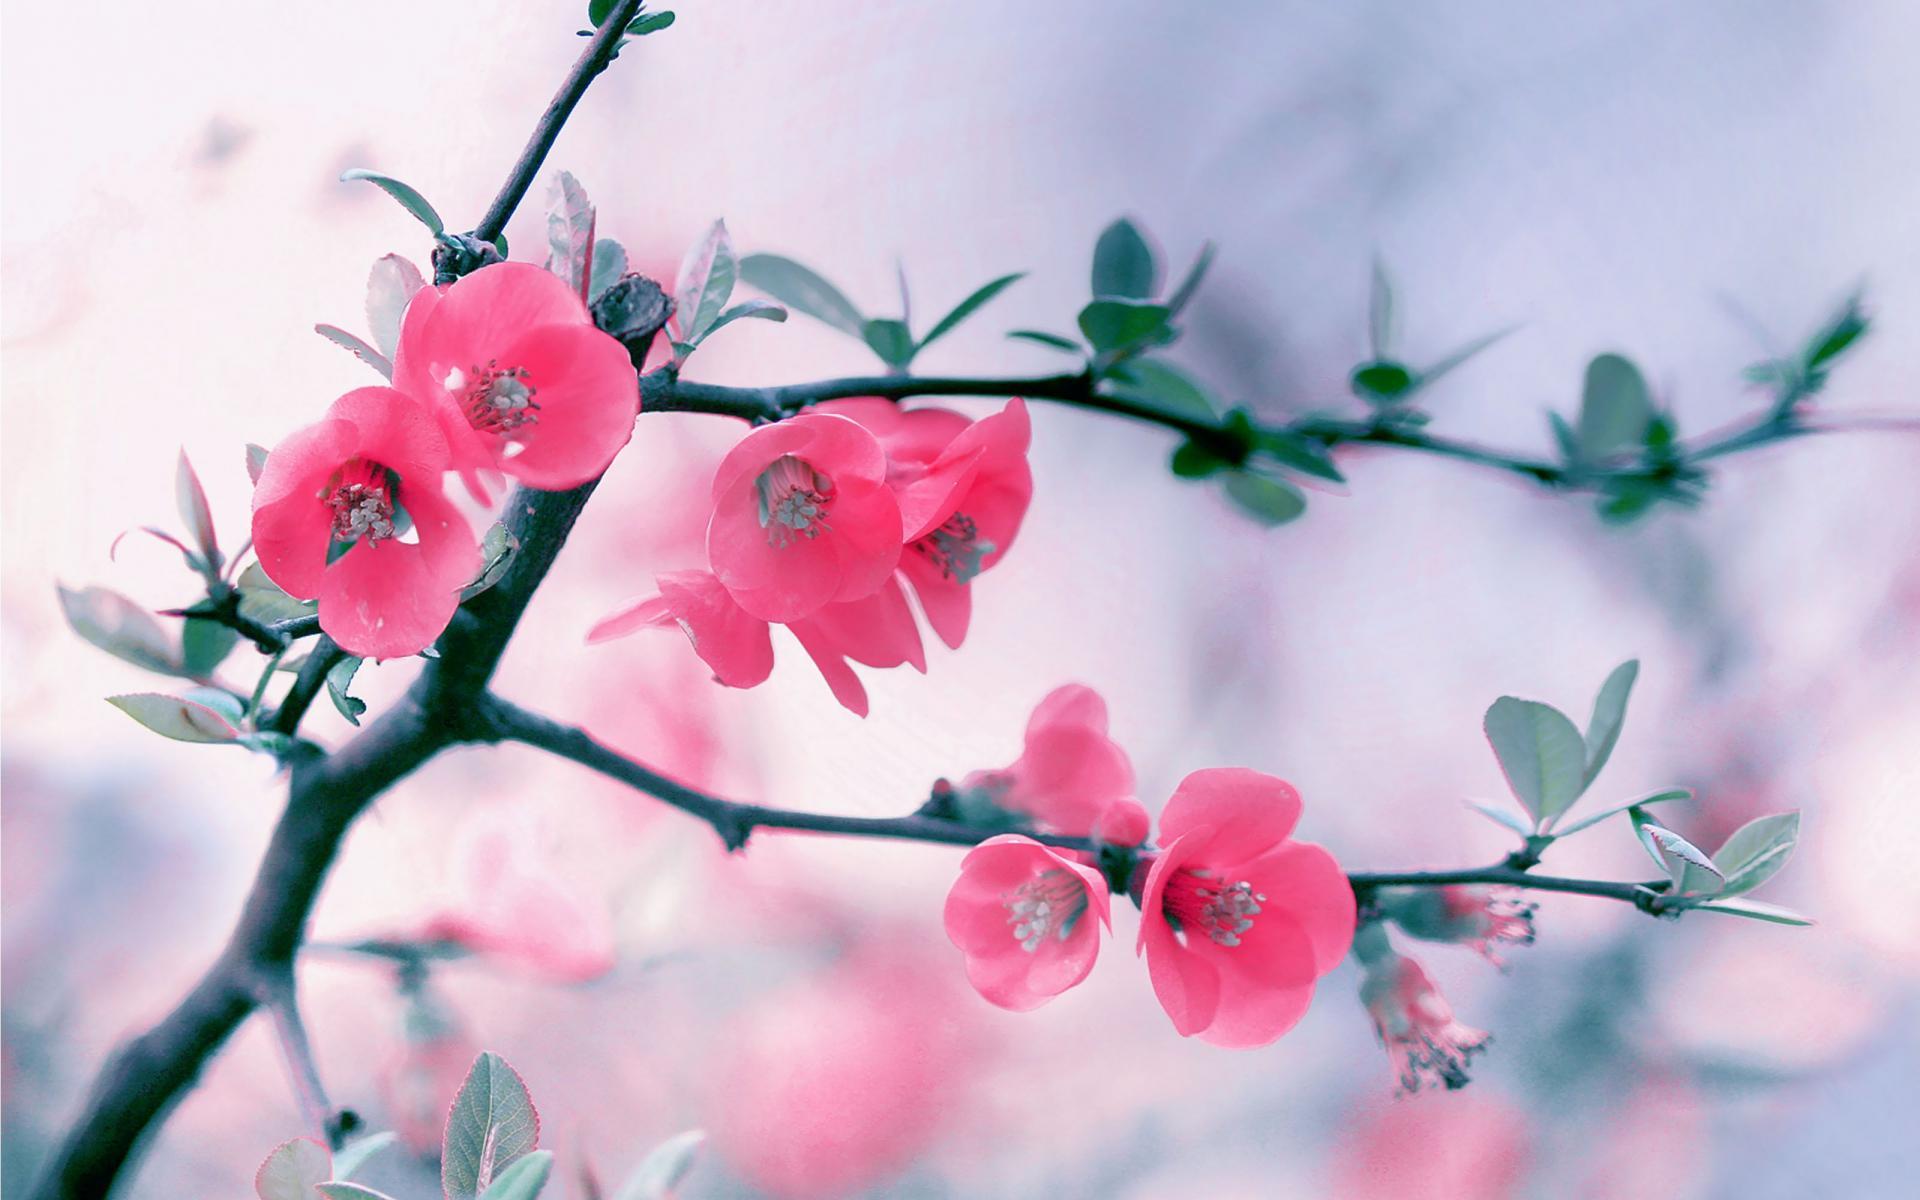 Blossom · Blossom · Blossom · Blossom ...